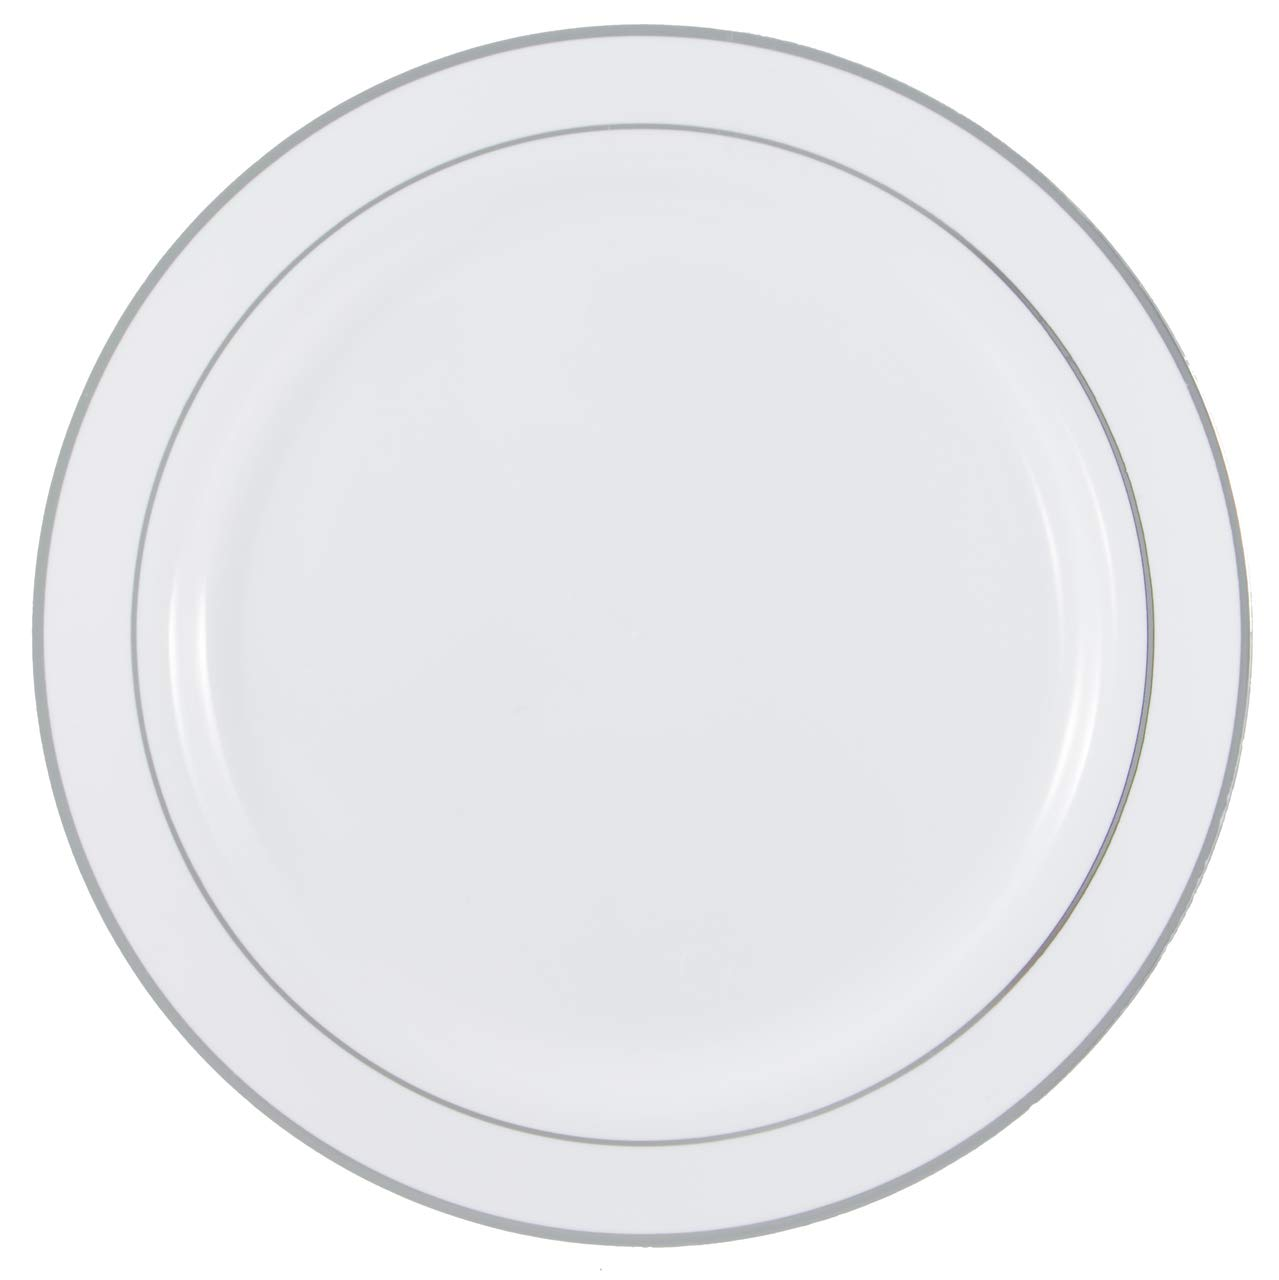 120 Pieces 9'' Elegant White, Silver Rimmed Plastic Round Plates